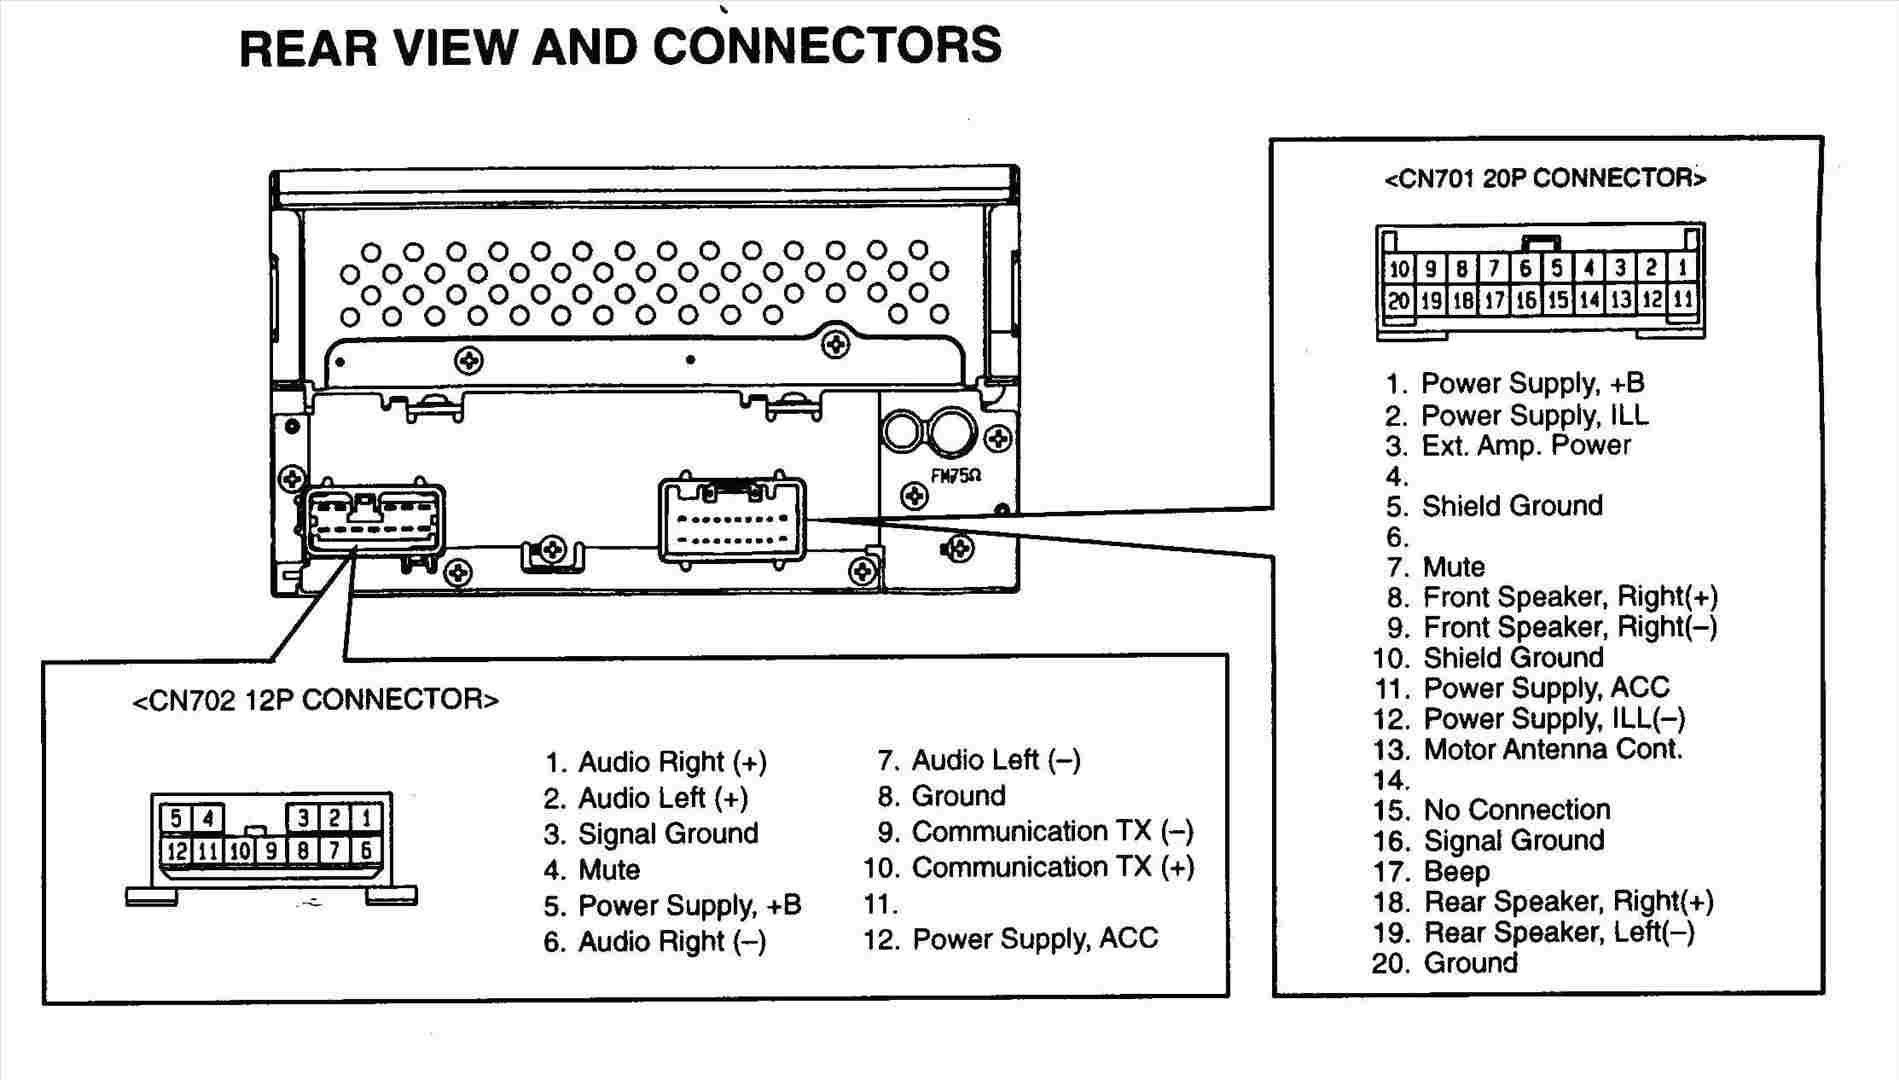 Illustration Of Rhdavisfamilyreunionus Toyota 2009 Toyota Camry Engine Diagram Tacoma Electrical Wiring Diagr Electrical Wiring Diagram Car Stereo Toyota Camry